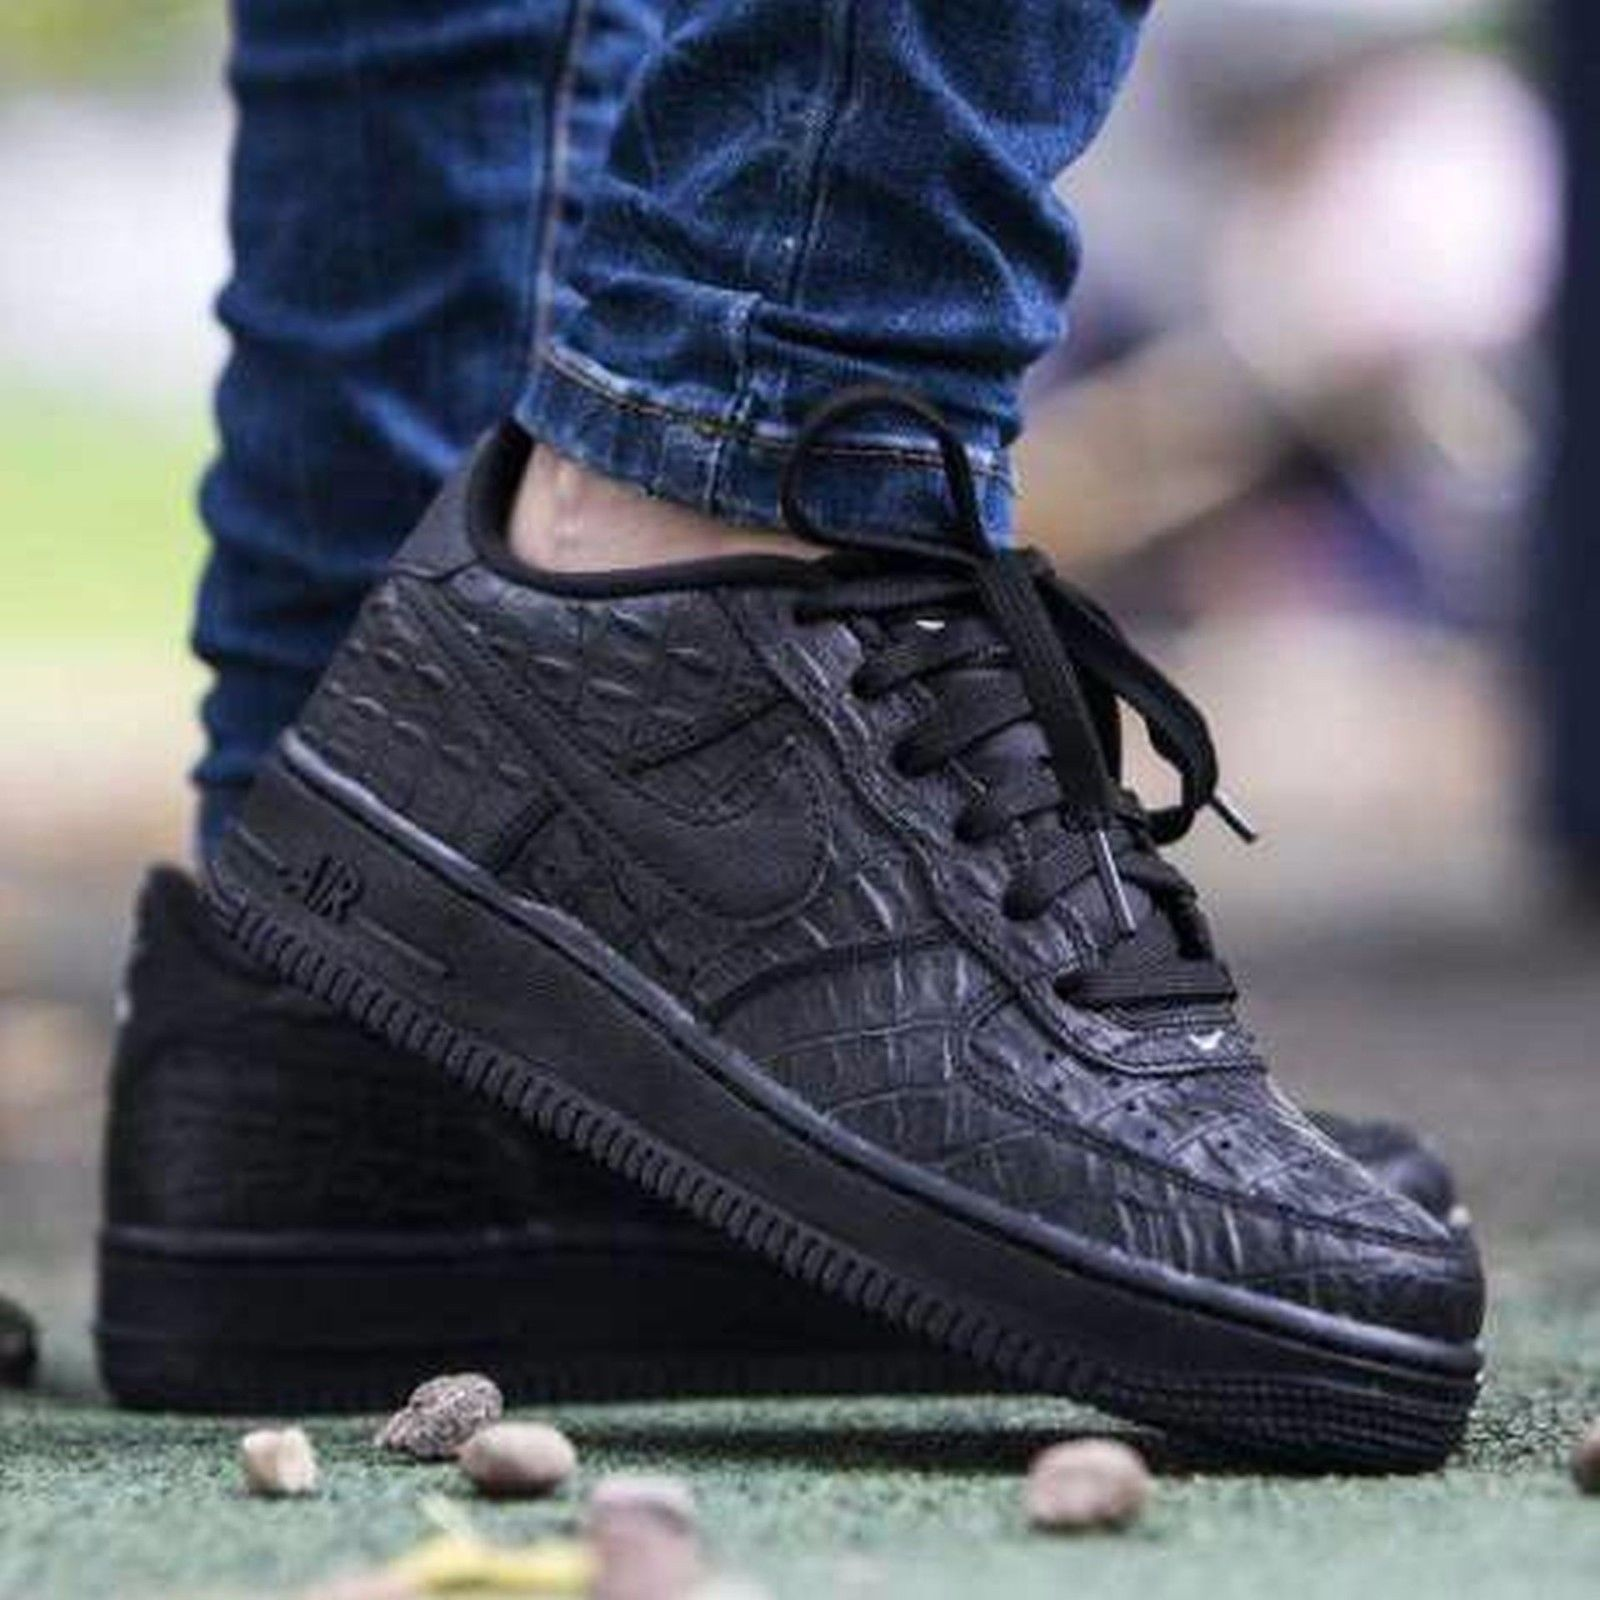 Nike Air Force 1 07 LV8 Black Croc 718152-007 Mens Sz 14 BLACK ... 38fed7e962cc